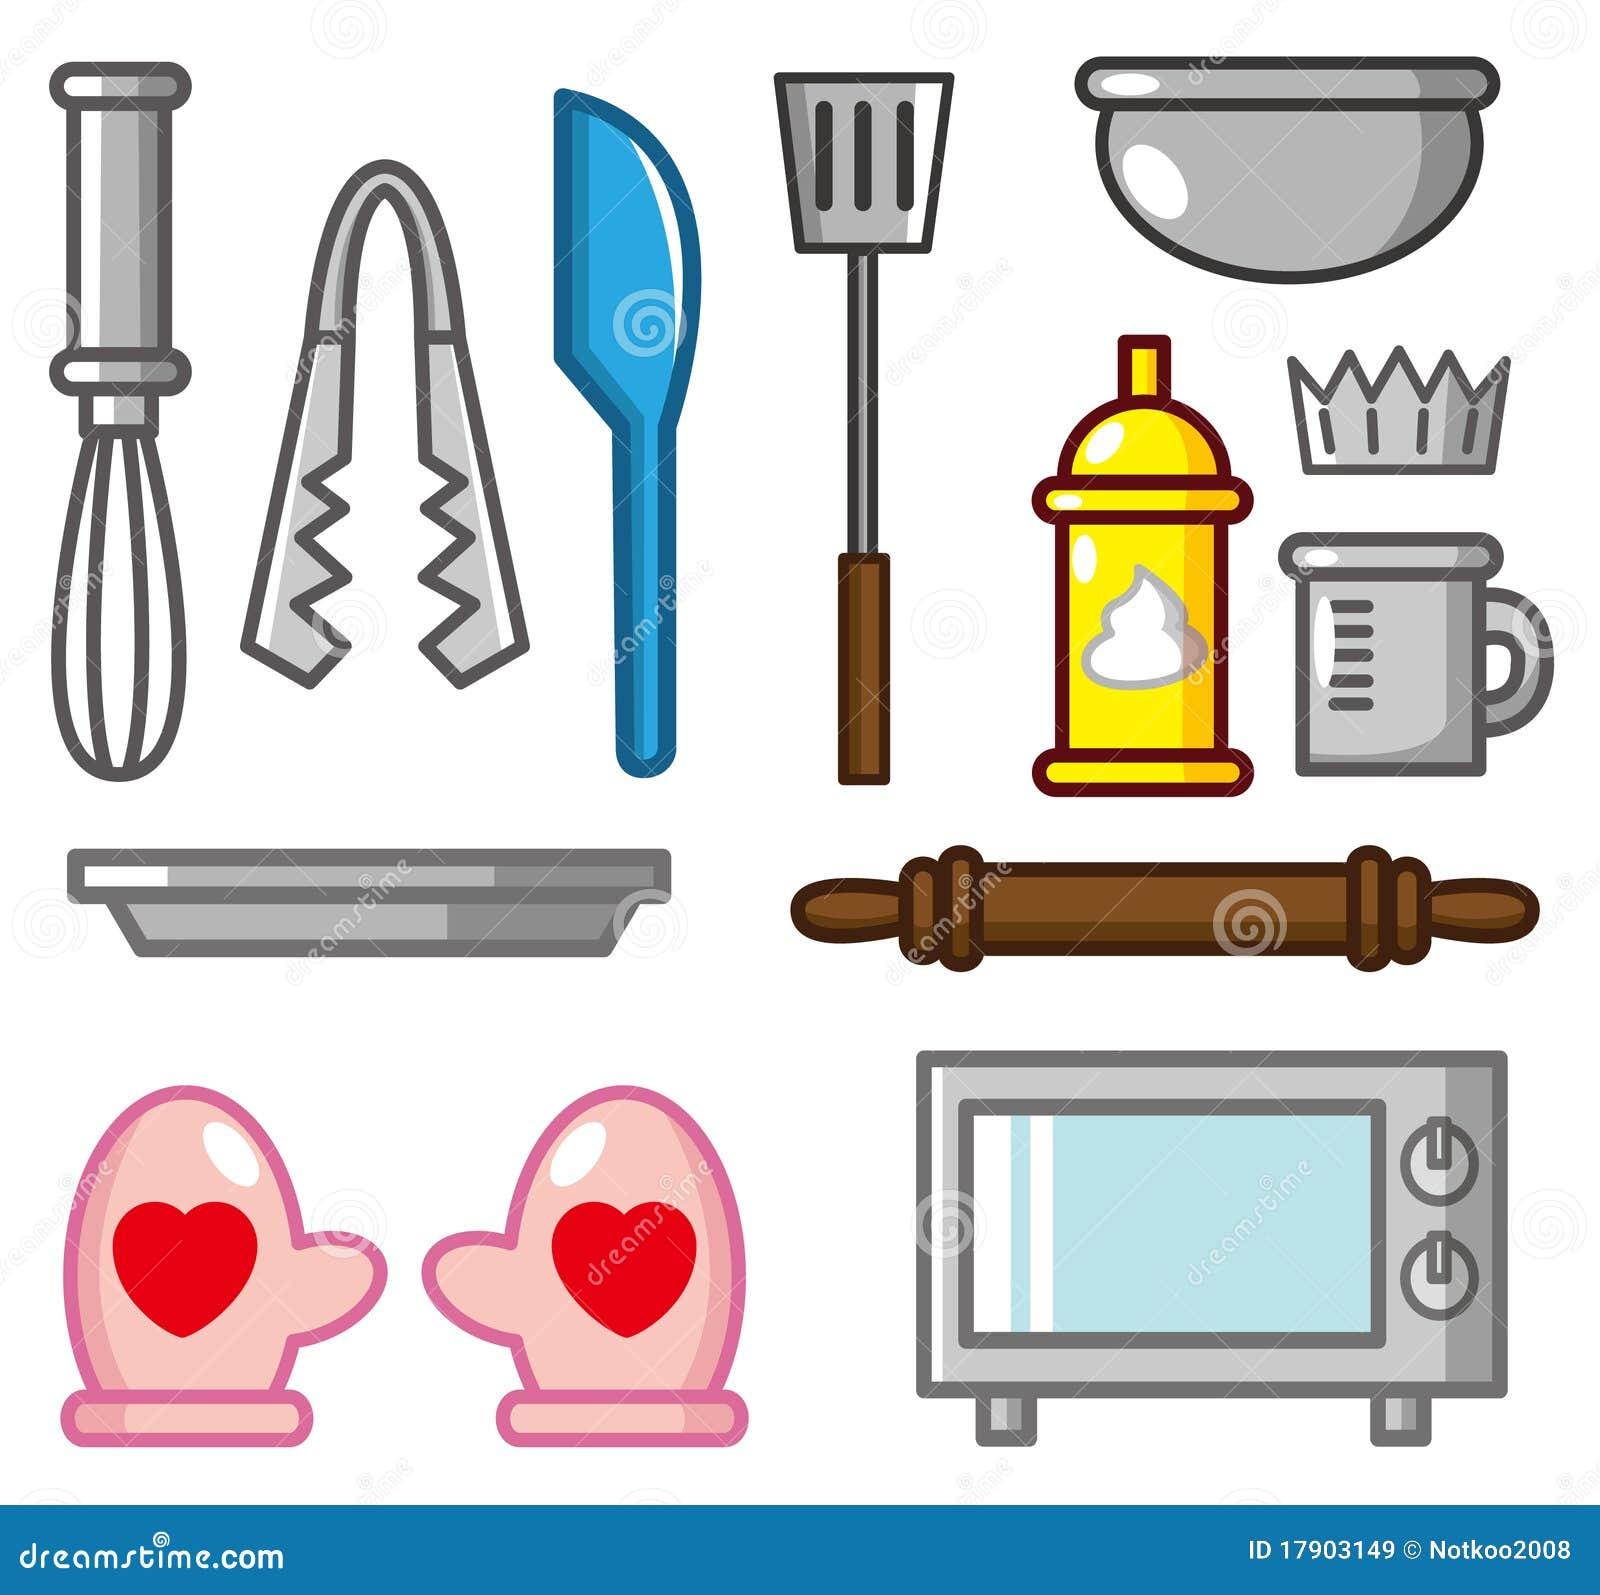 Kitchen Shears In Baking: Cartoon Kitchen Tool Icon Set Cartoon Vector